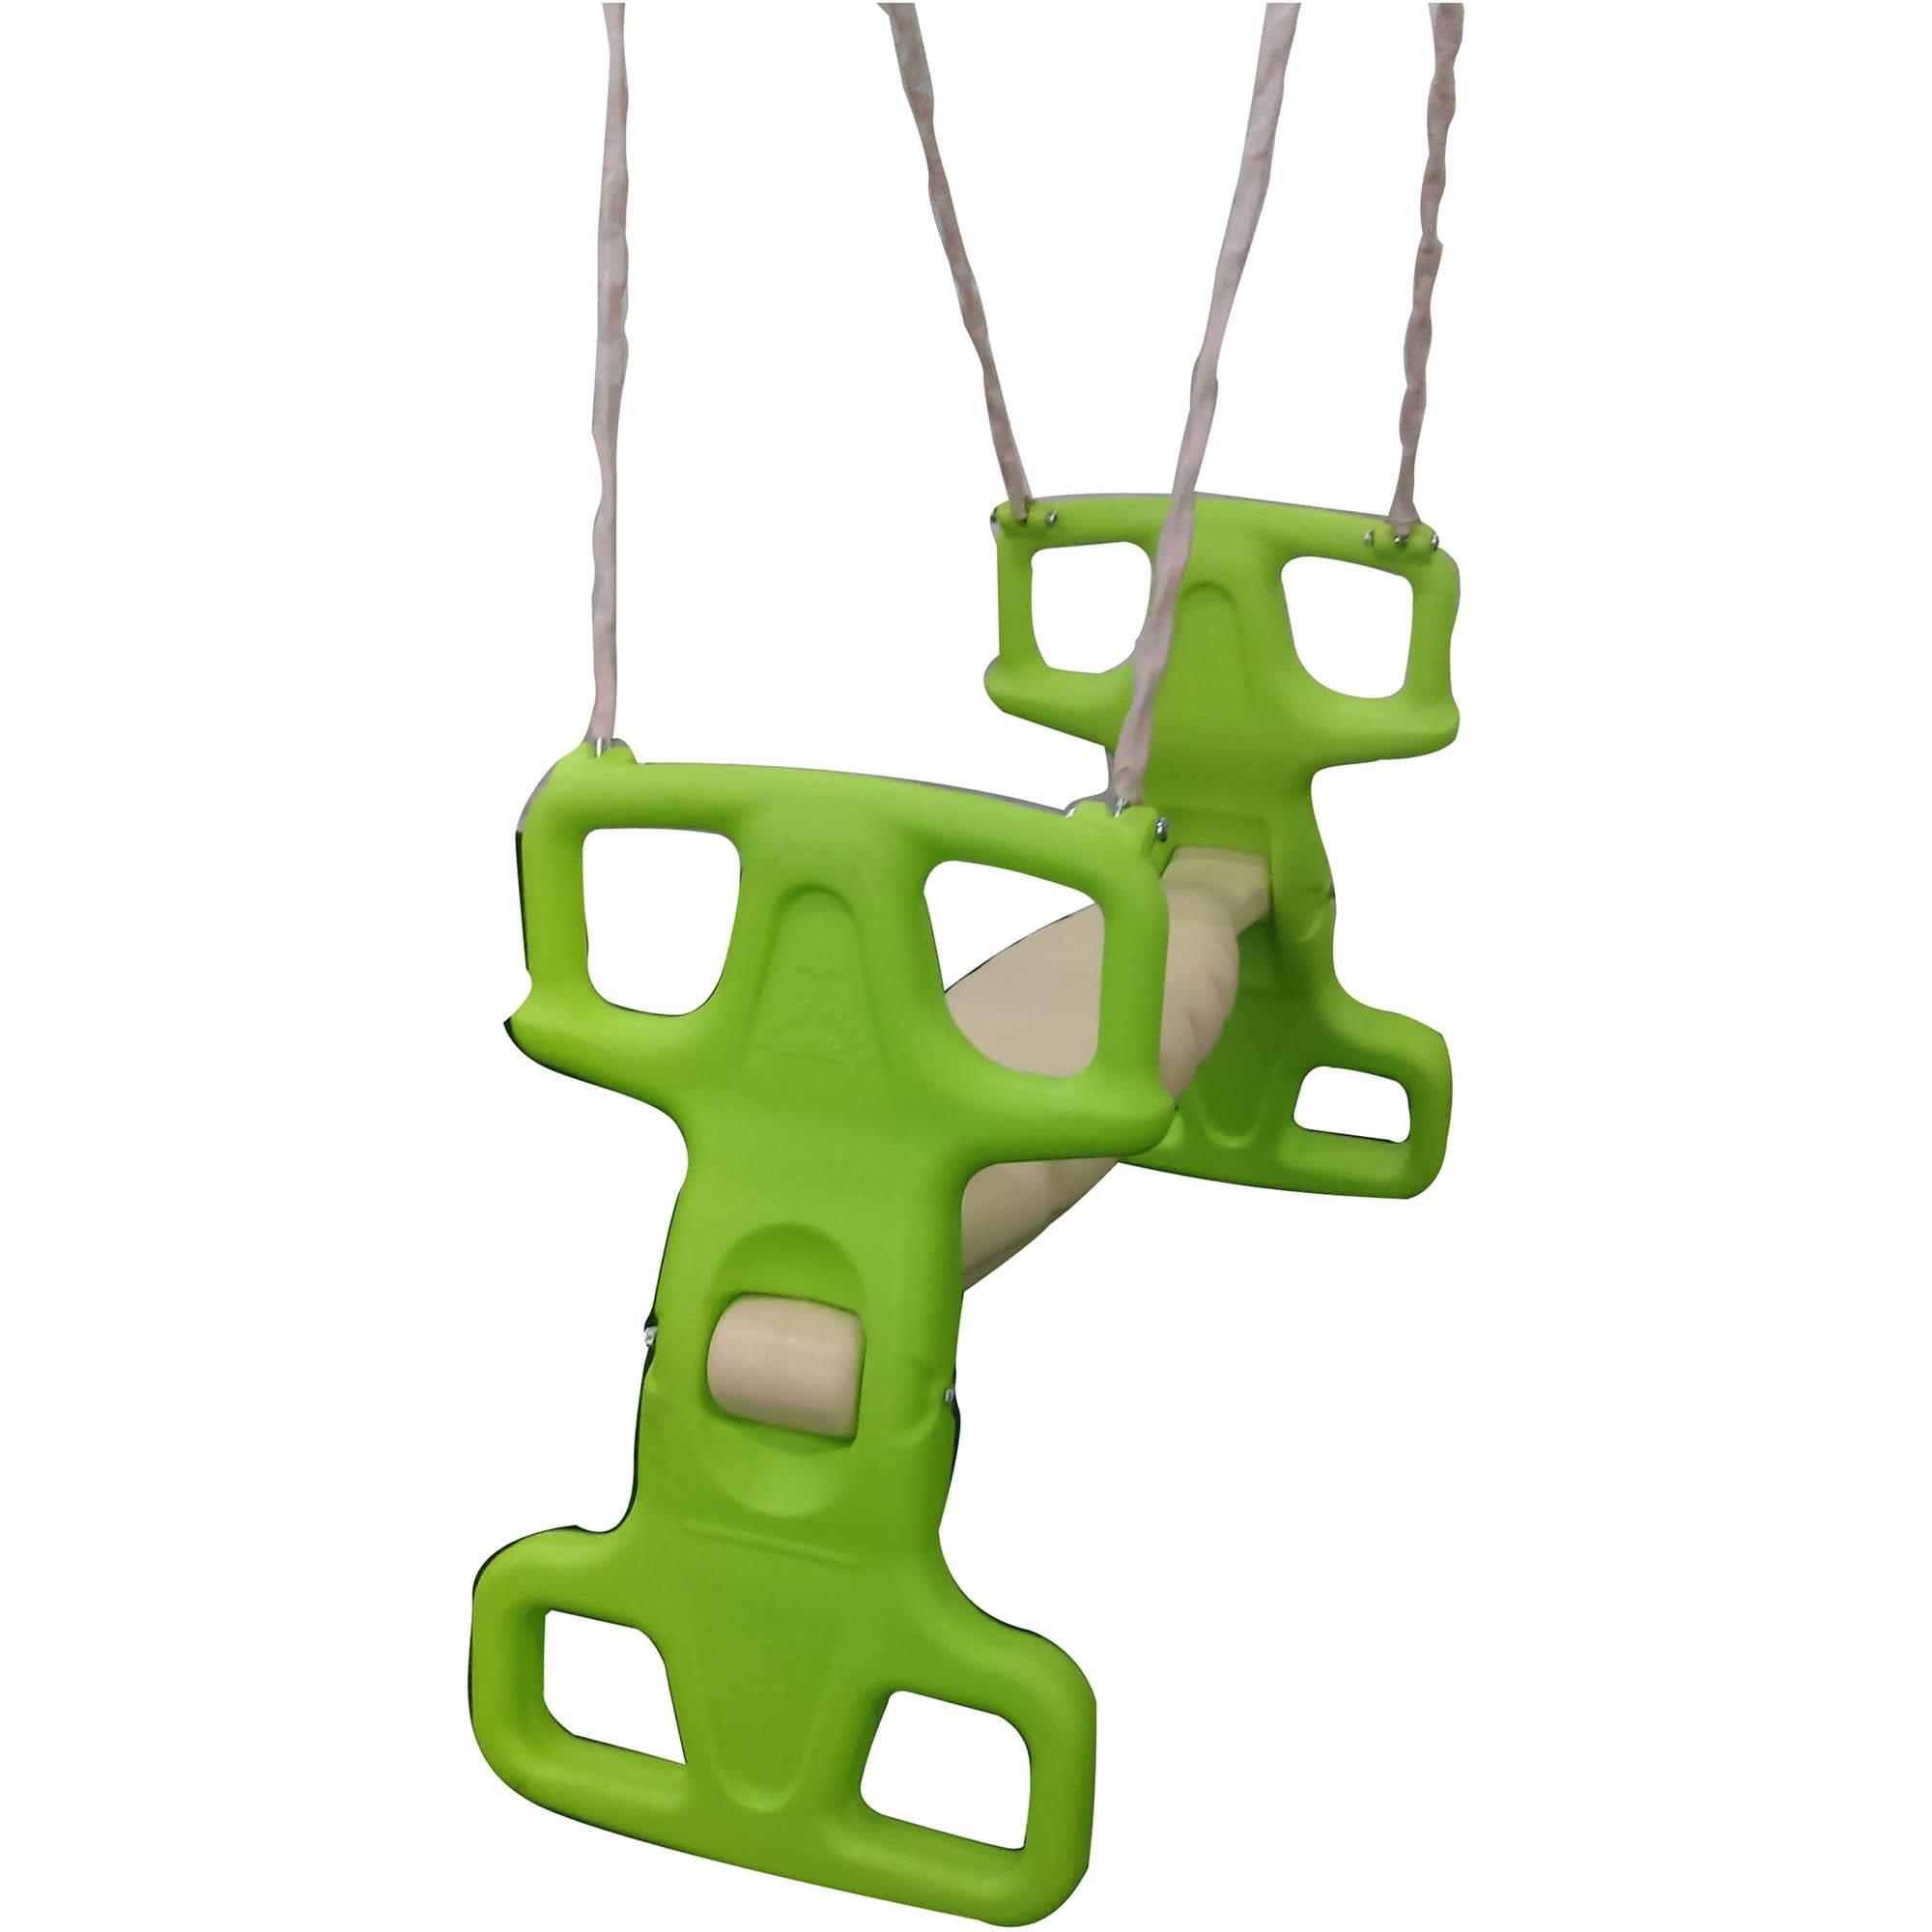 Flexible Flyer Parakeet Green Rocket Rider Tandem Swing Assembly